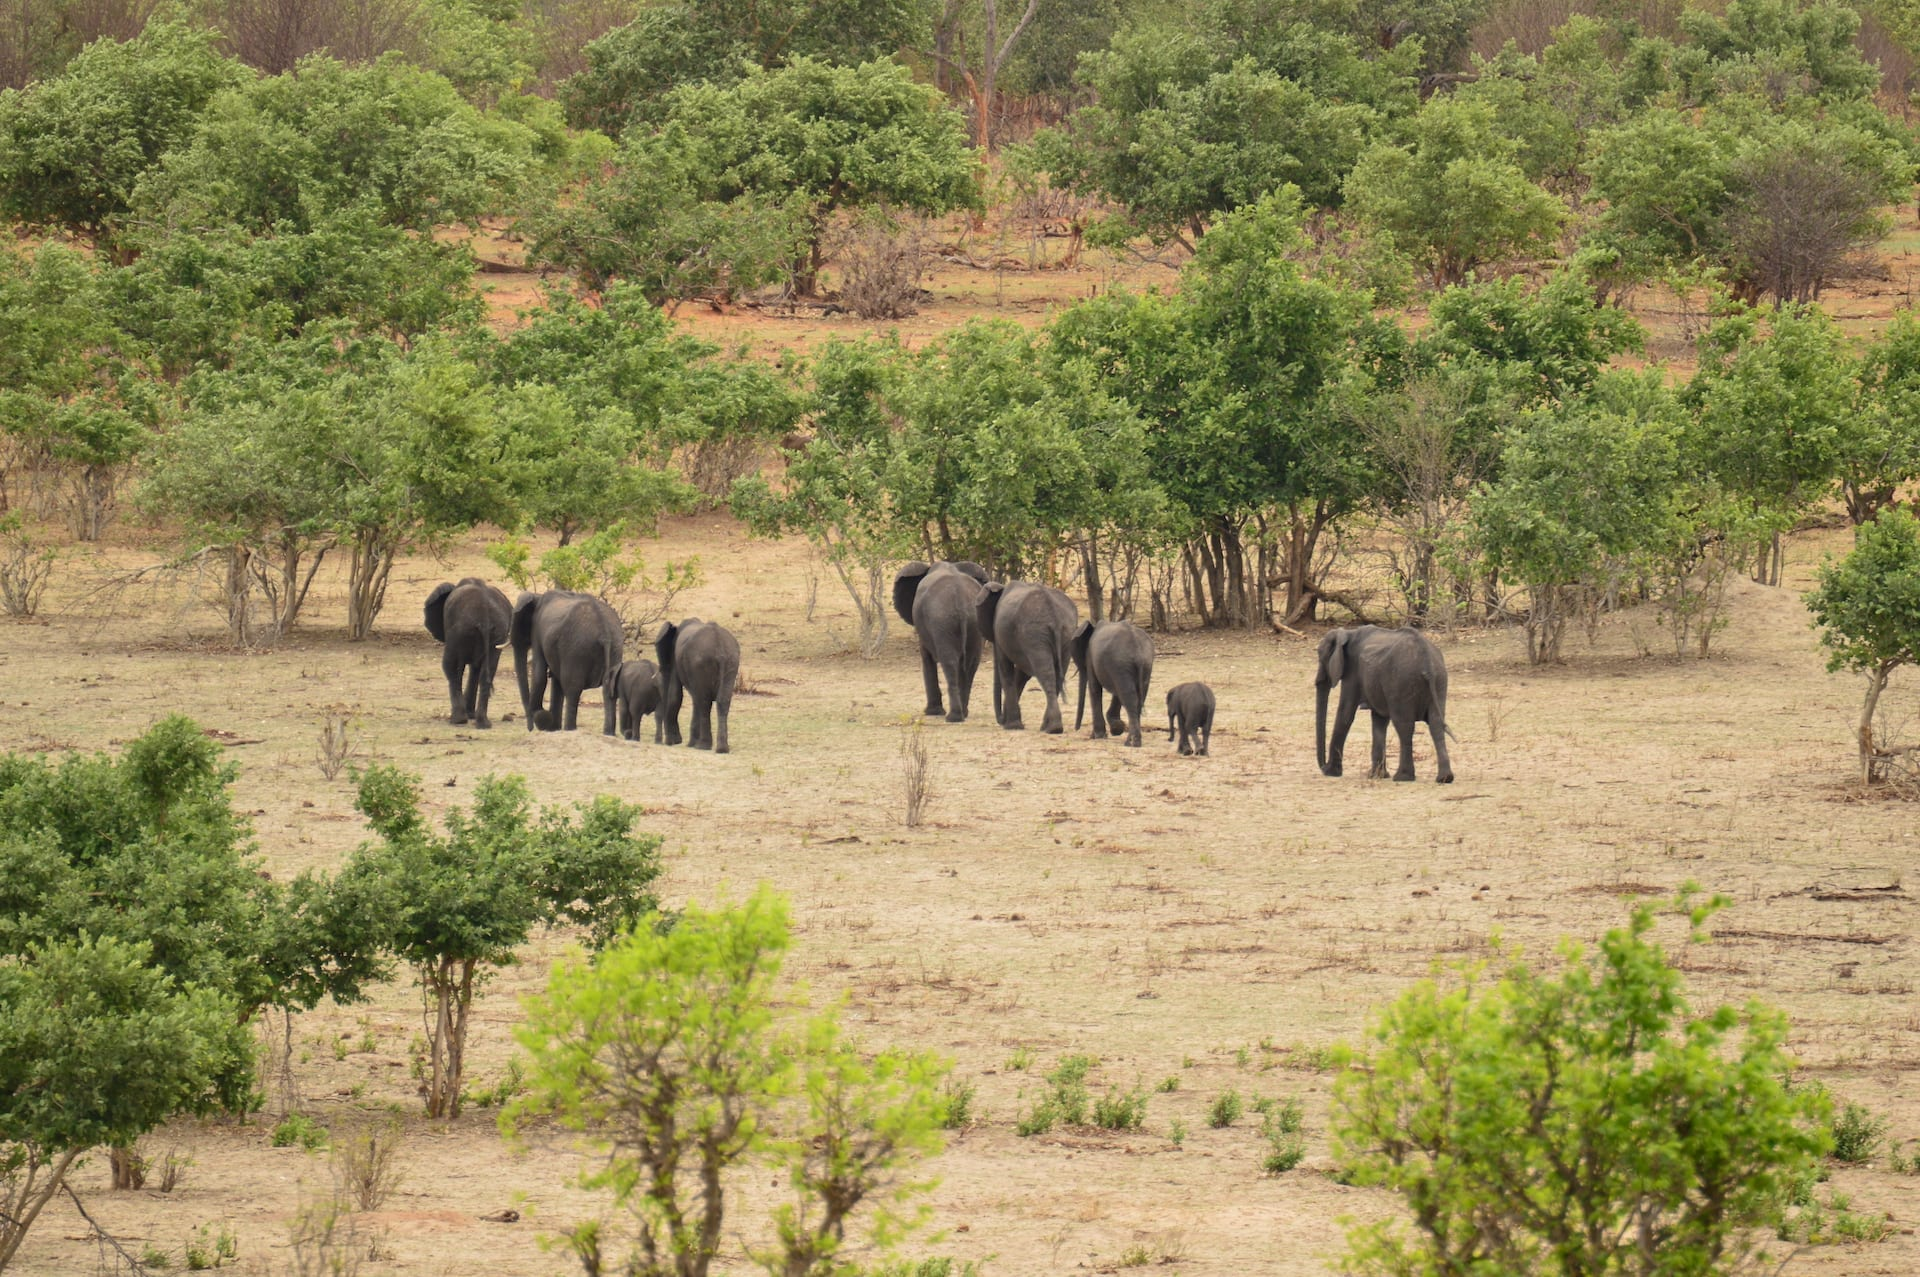 ALGEMEEN - BW - Chobe Olifanten lopend - BW 5